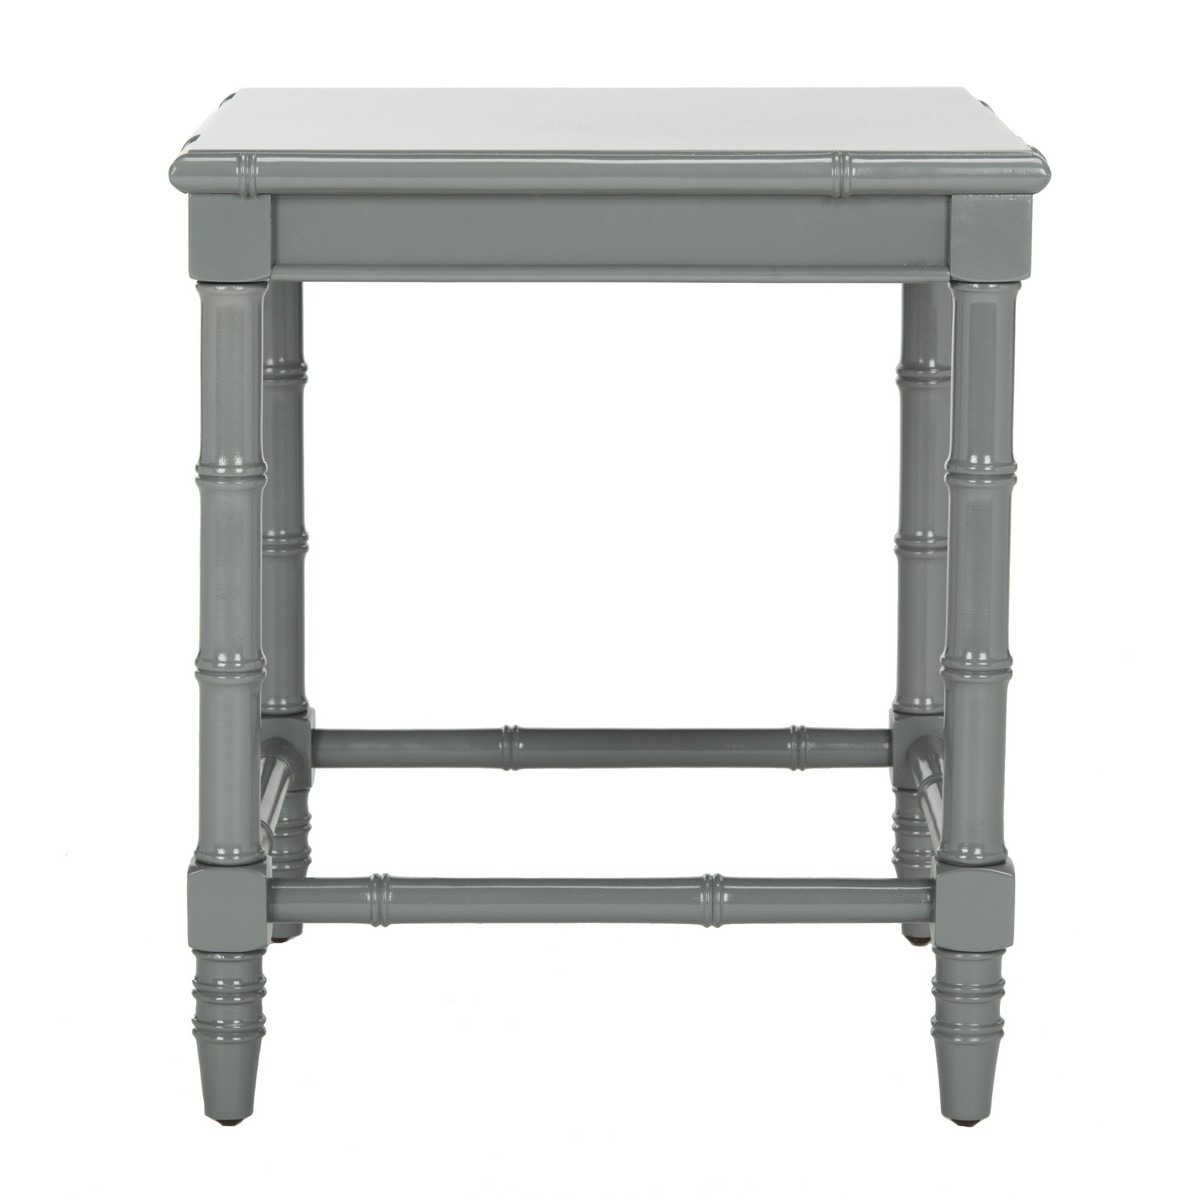 Table d'appoint gris